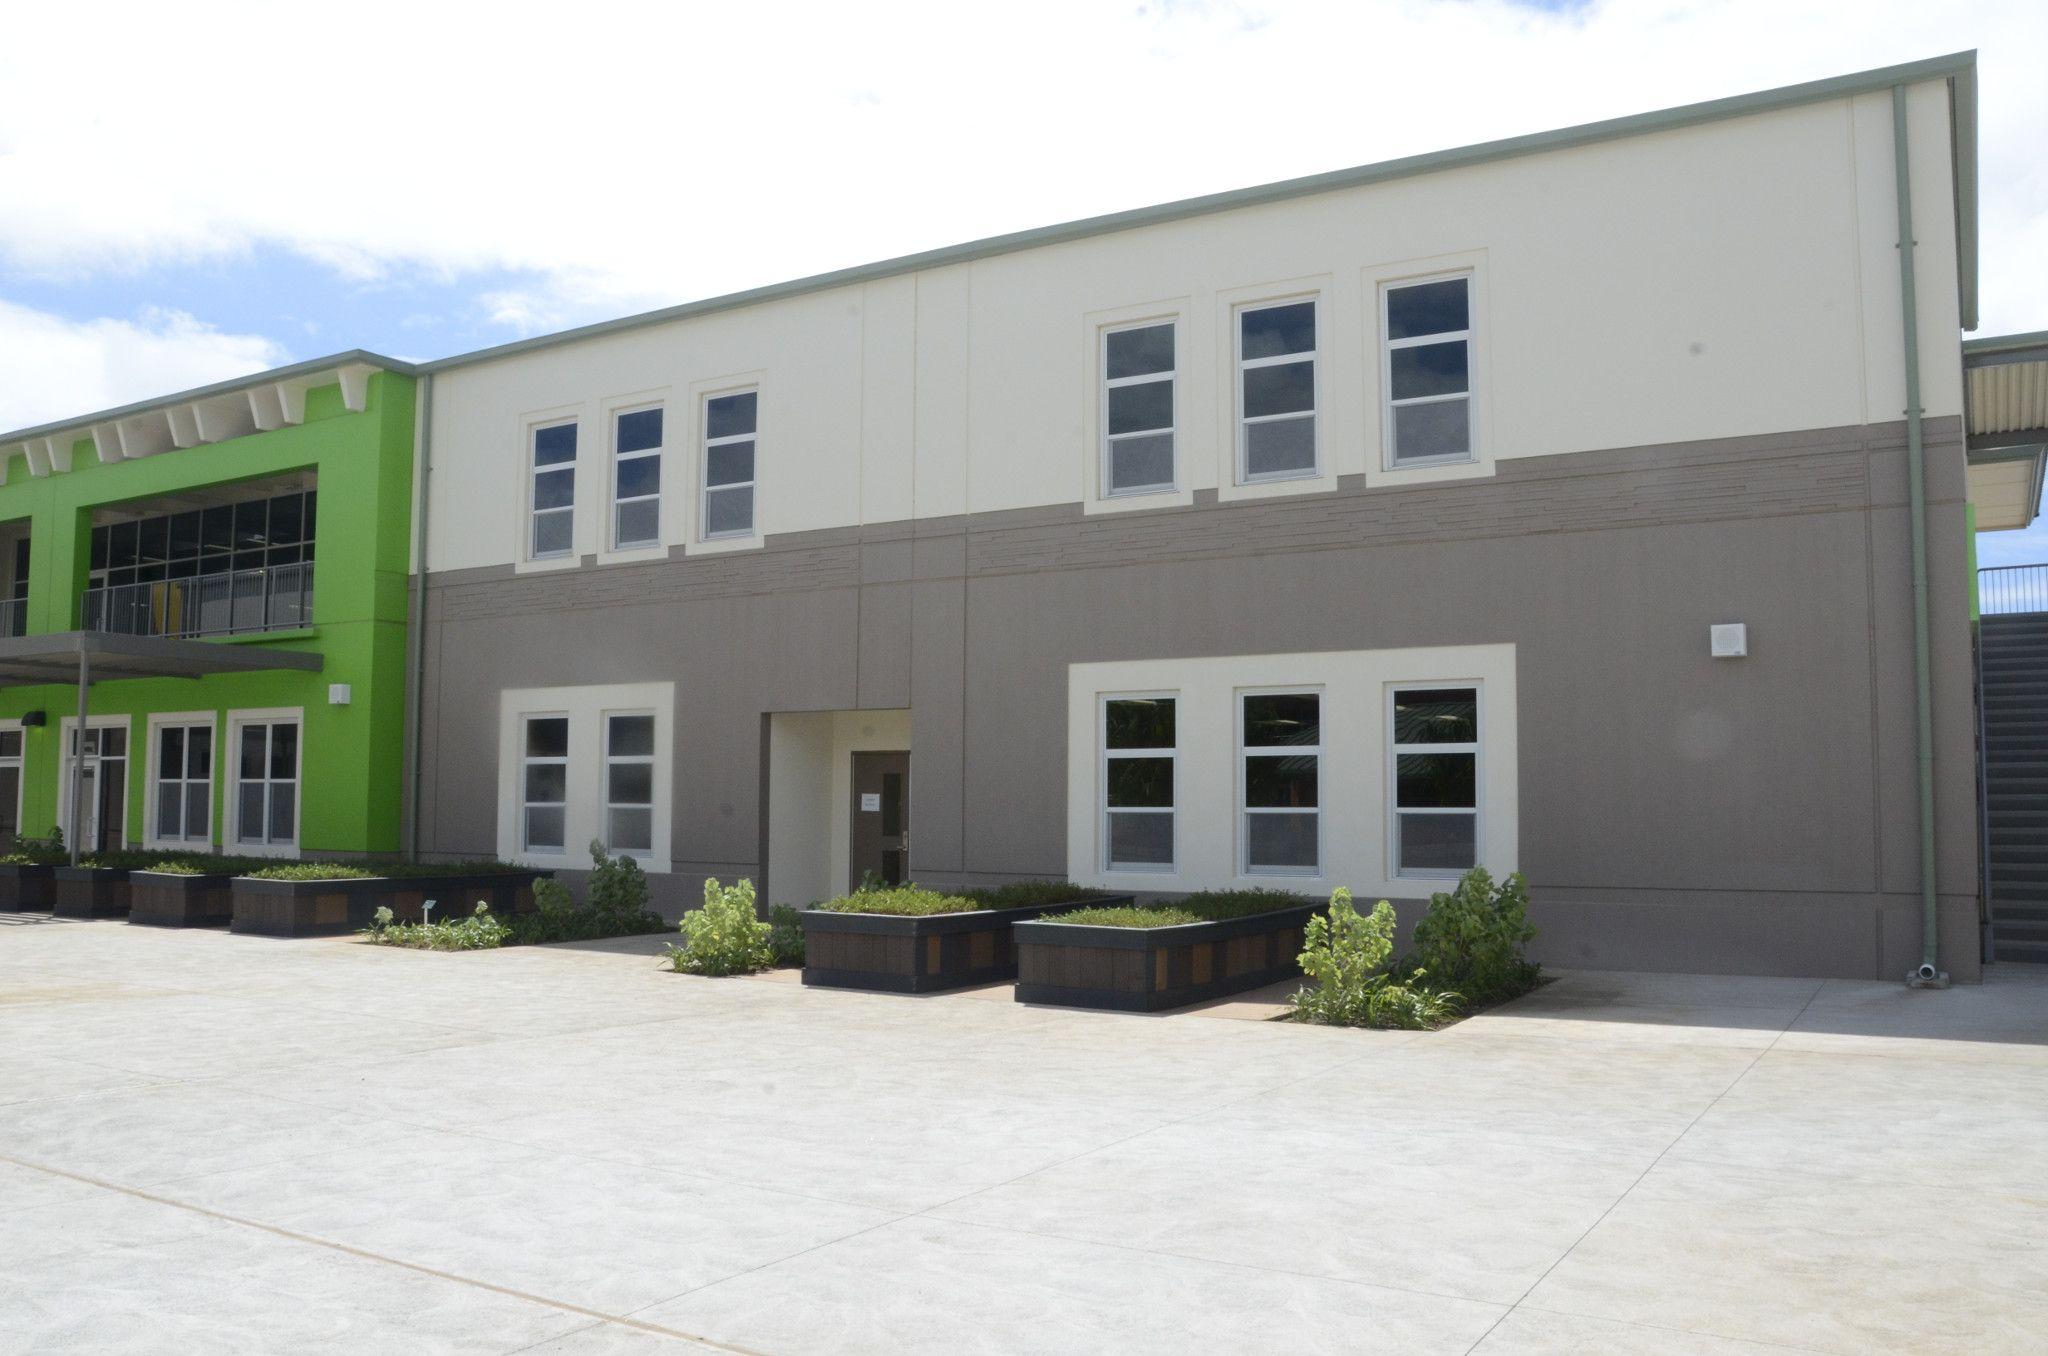 Ho'Okele Elementary School